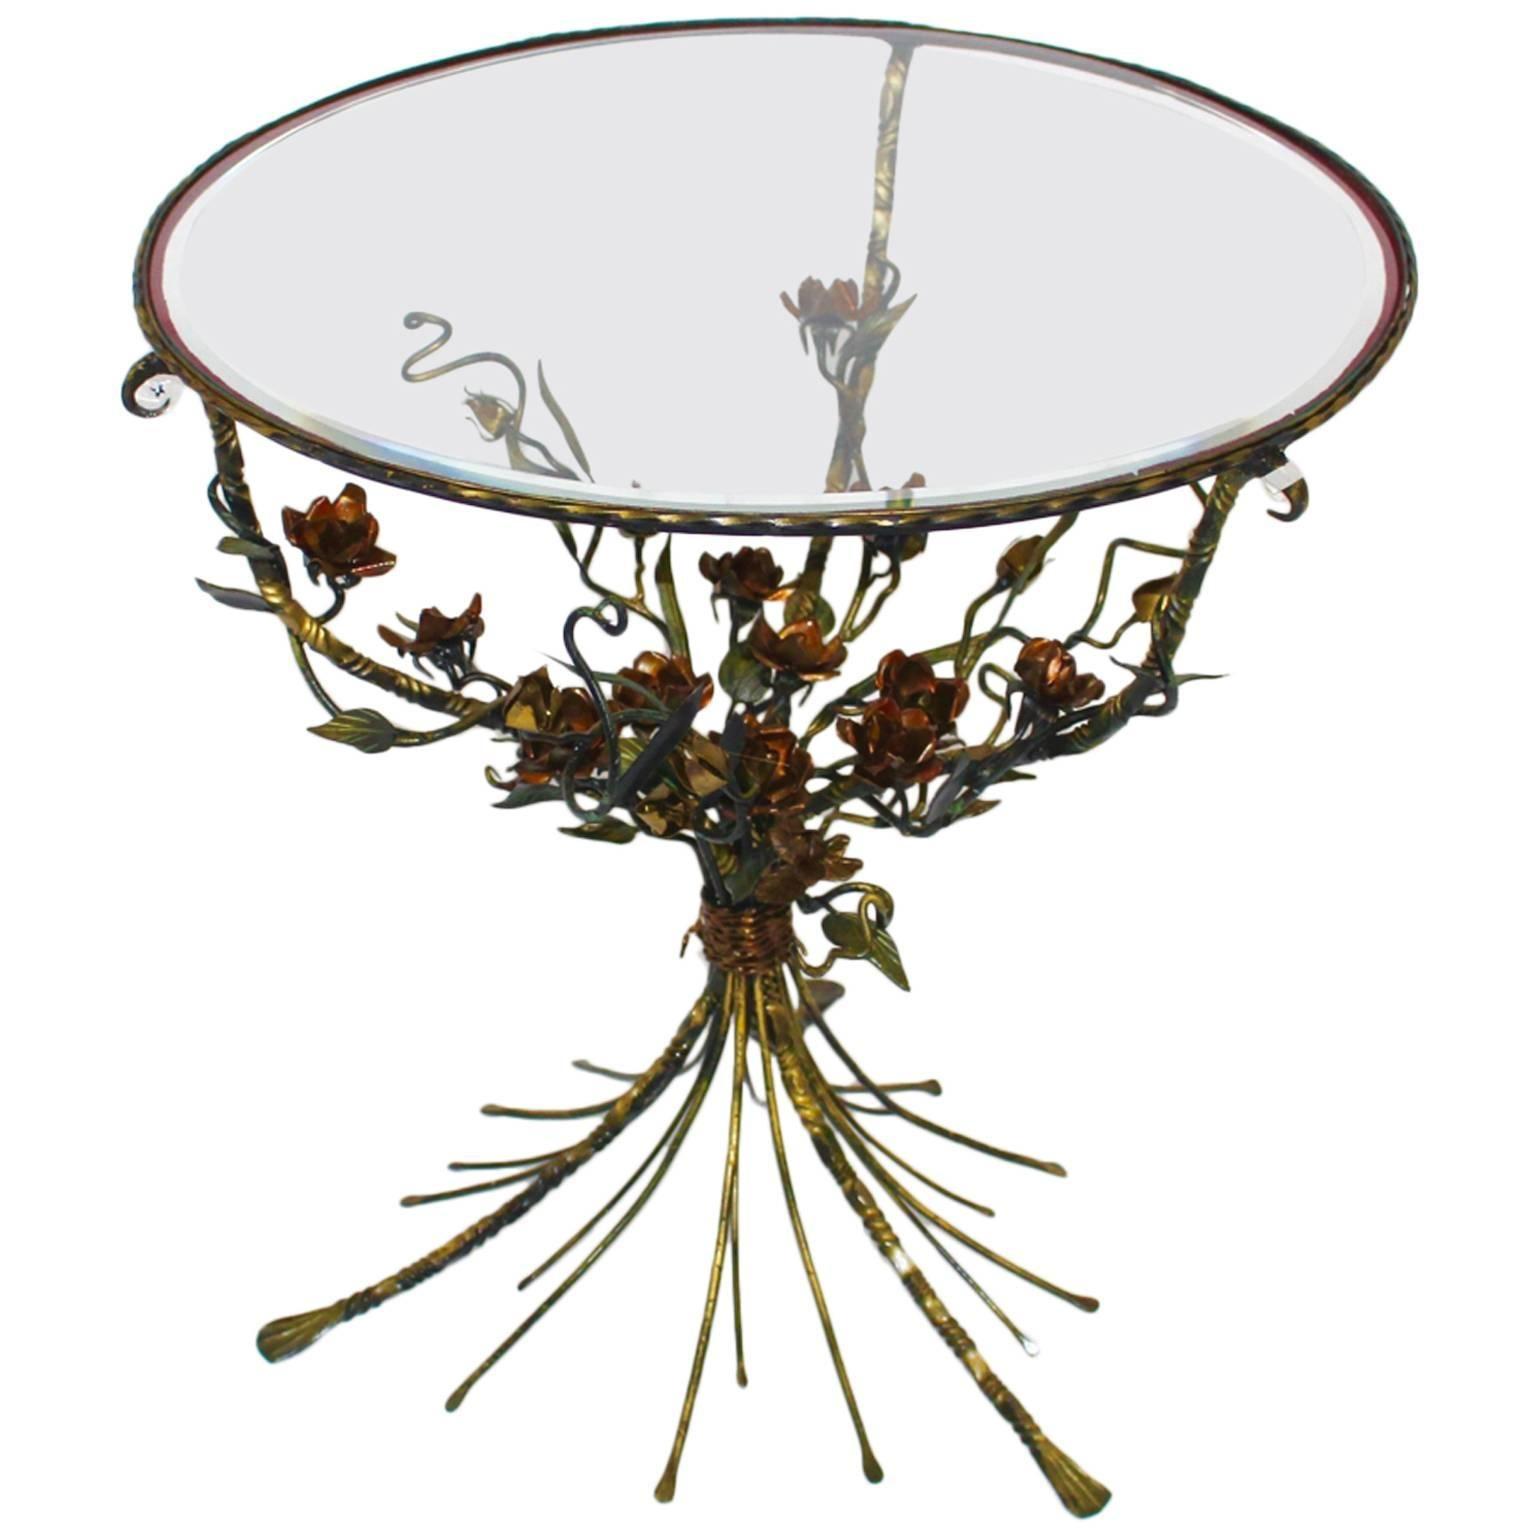 Hollywood Regency Style Vintage Metal Flower Coffee Table Side Table 1950s